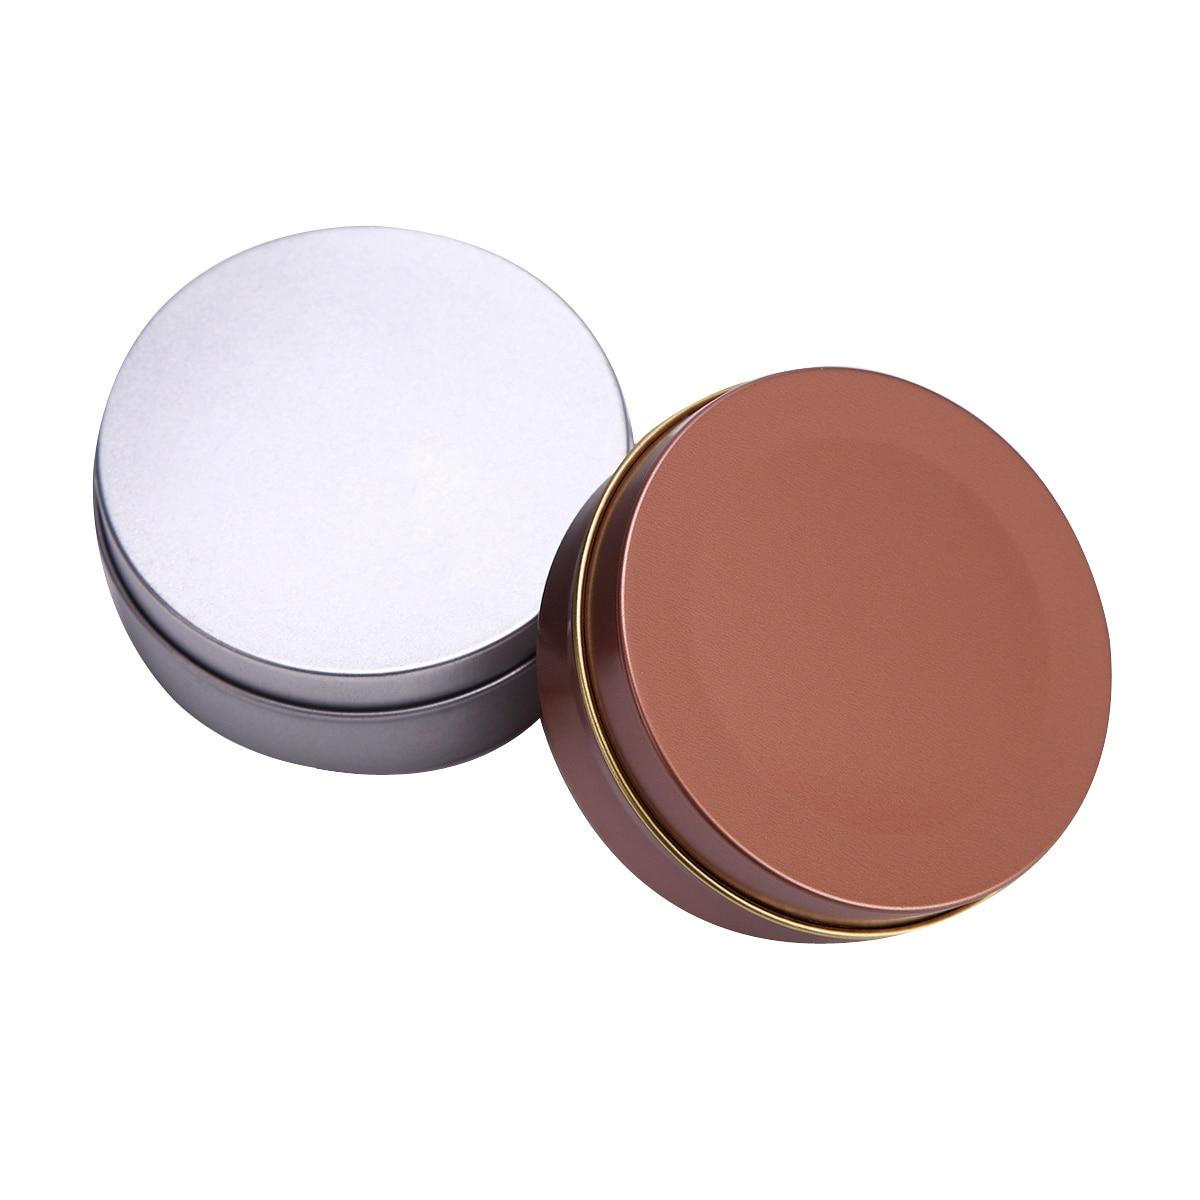 Portable Makeup Brush Sponge Cleaner - Quick Dust Box